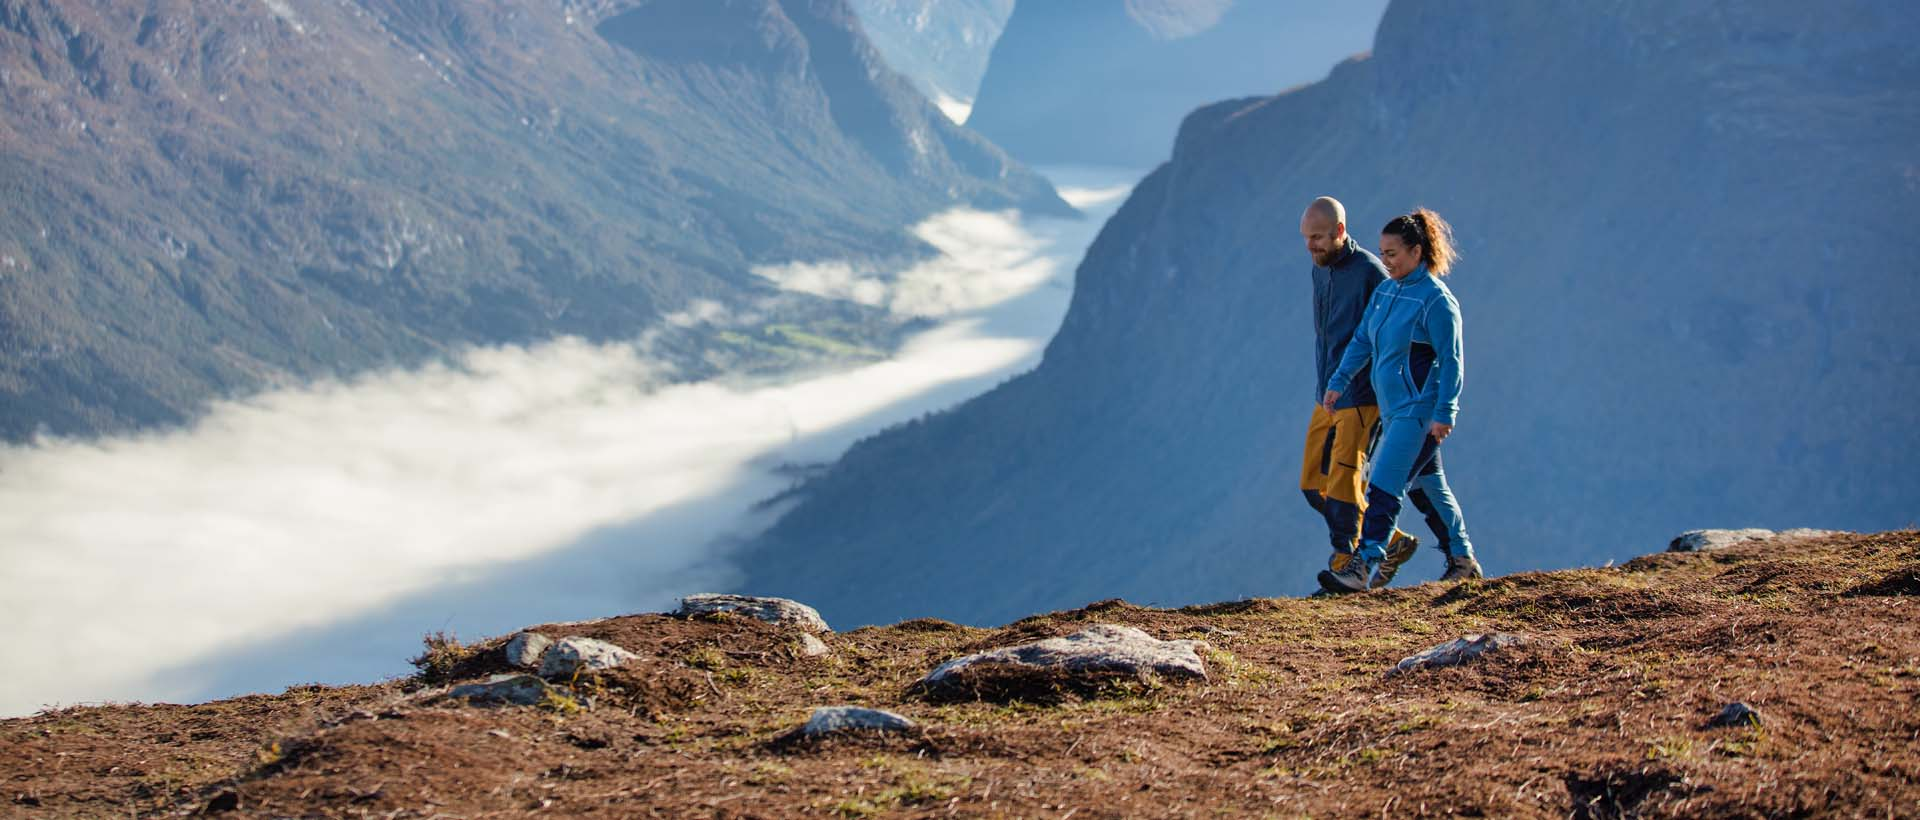 Skogstad Lønahorgi Turbukse Heather Rose | Fjellsport.no